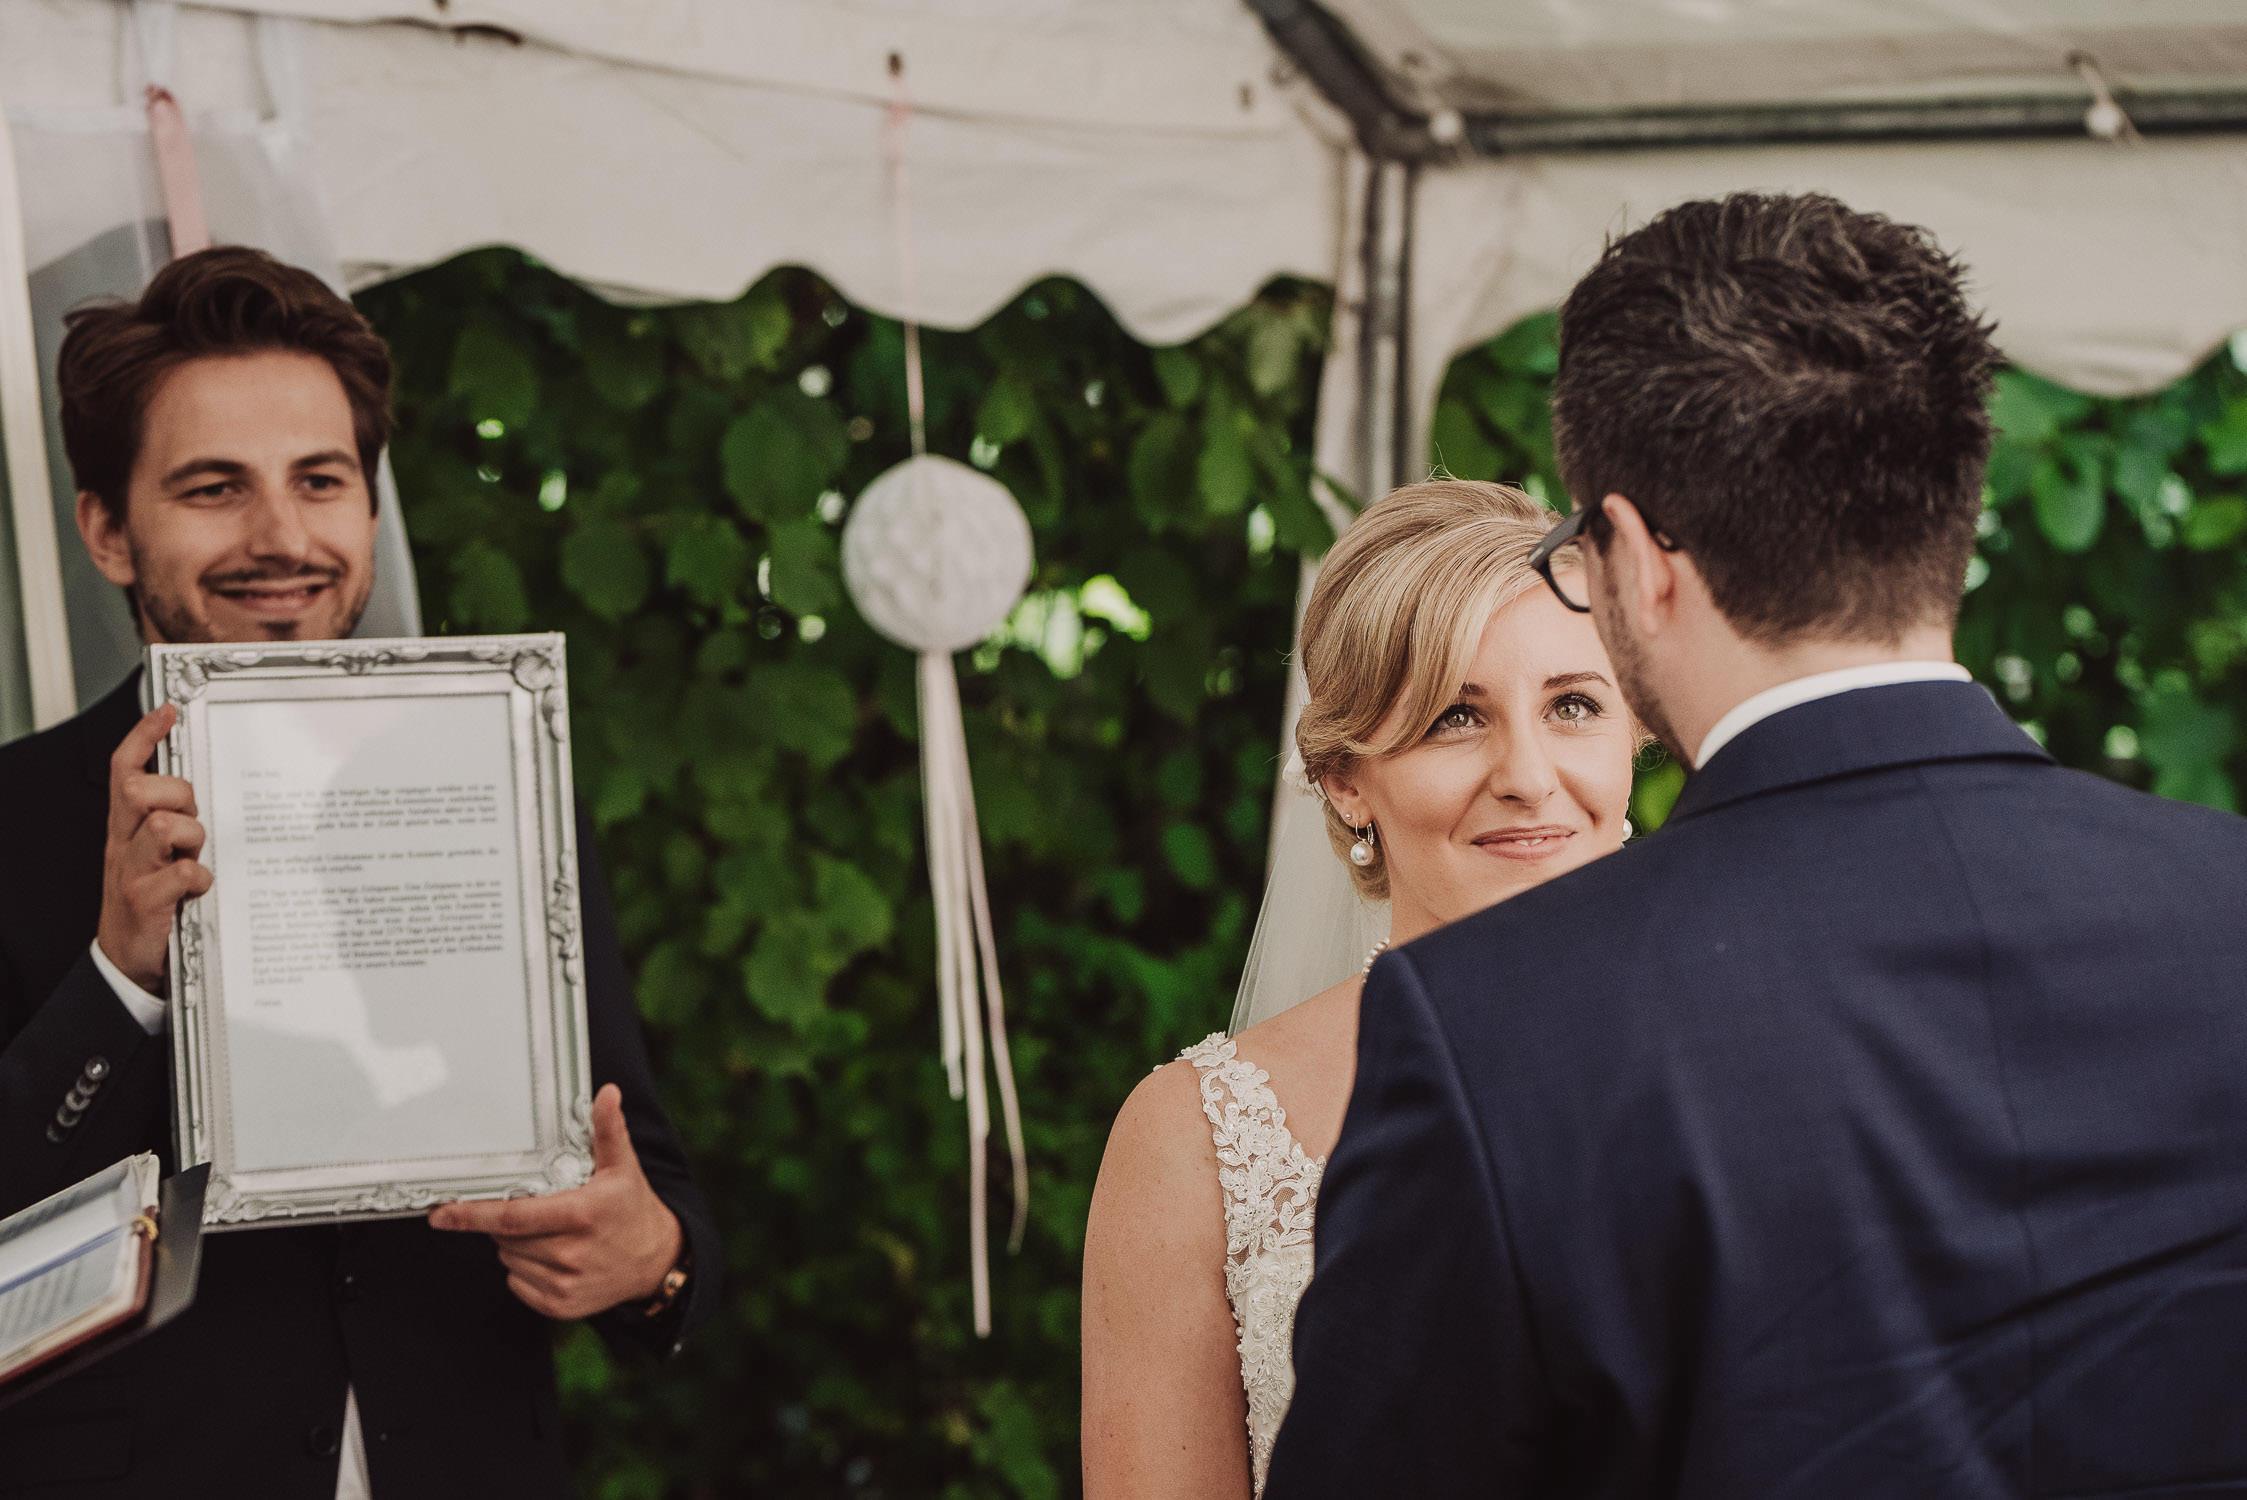 Hochzeitsfotograf Landau - Markus Husner